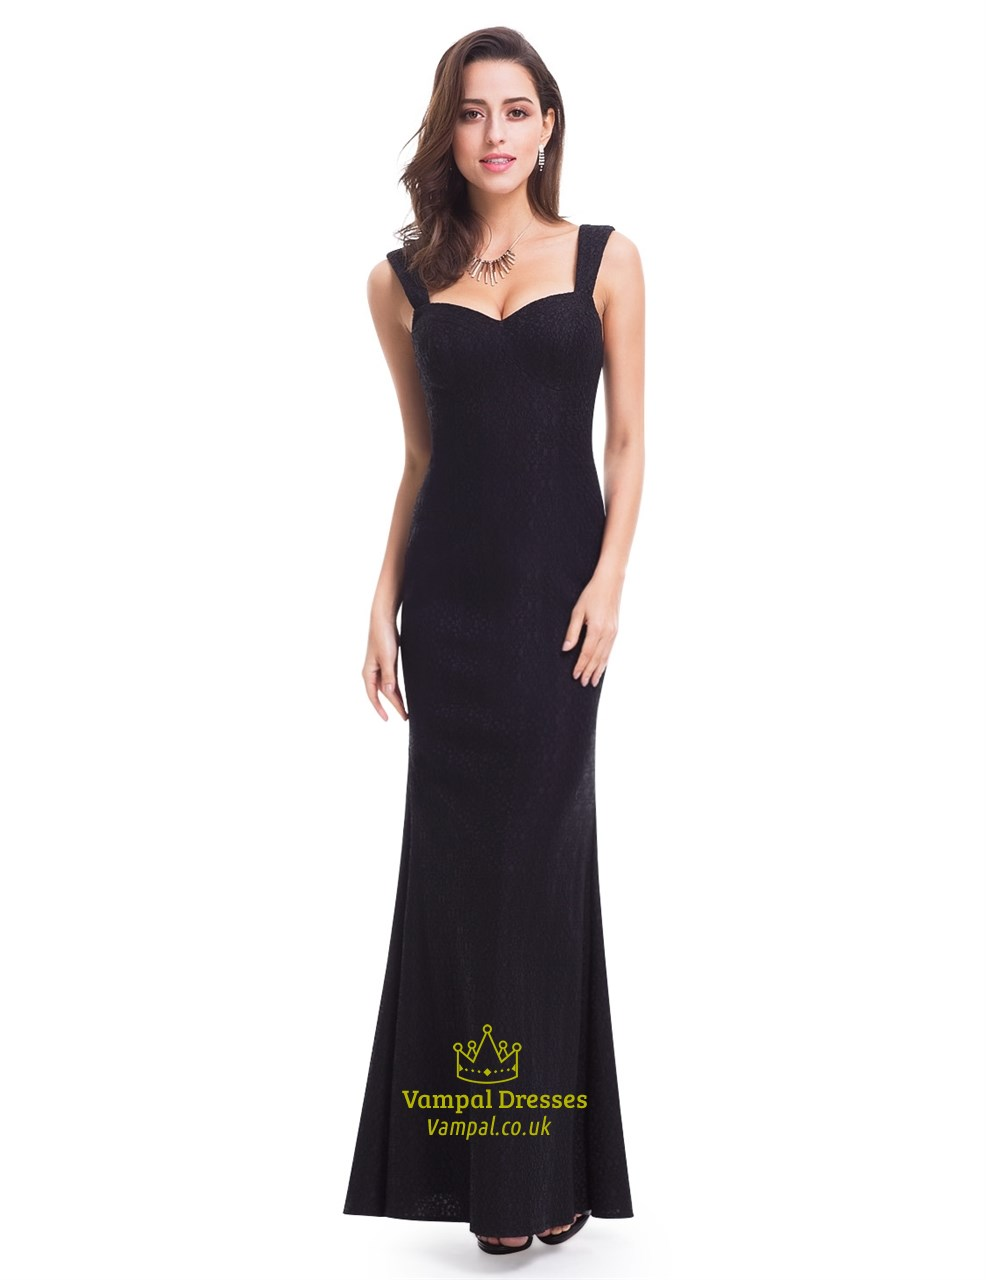 Black Sweetheart Neck Sleeveless Long Mermaid Prom Dress With Straps ...